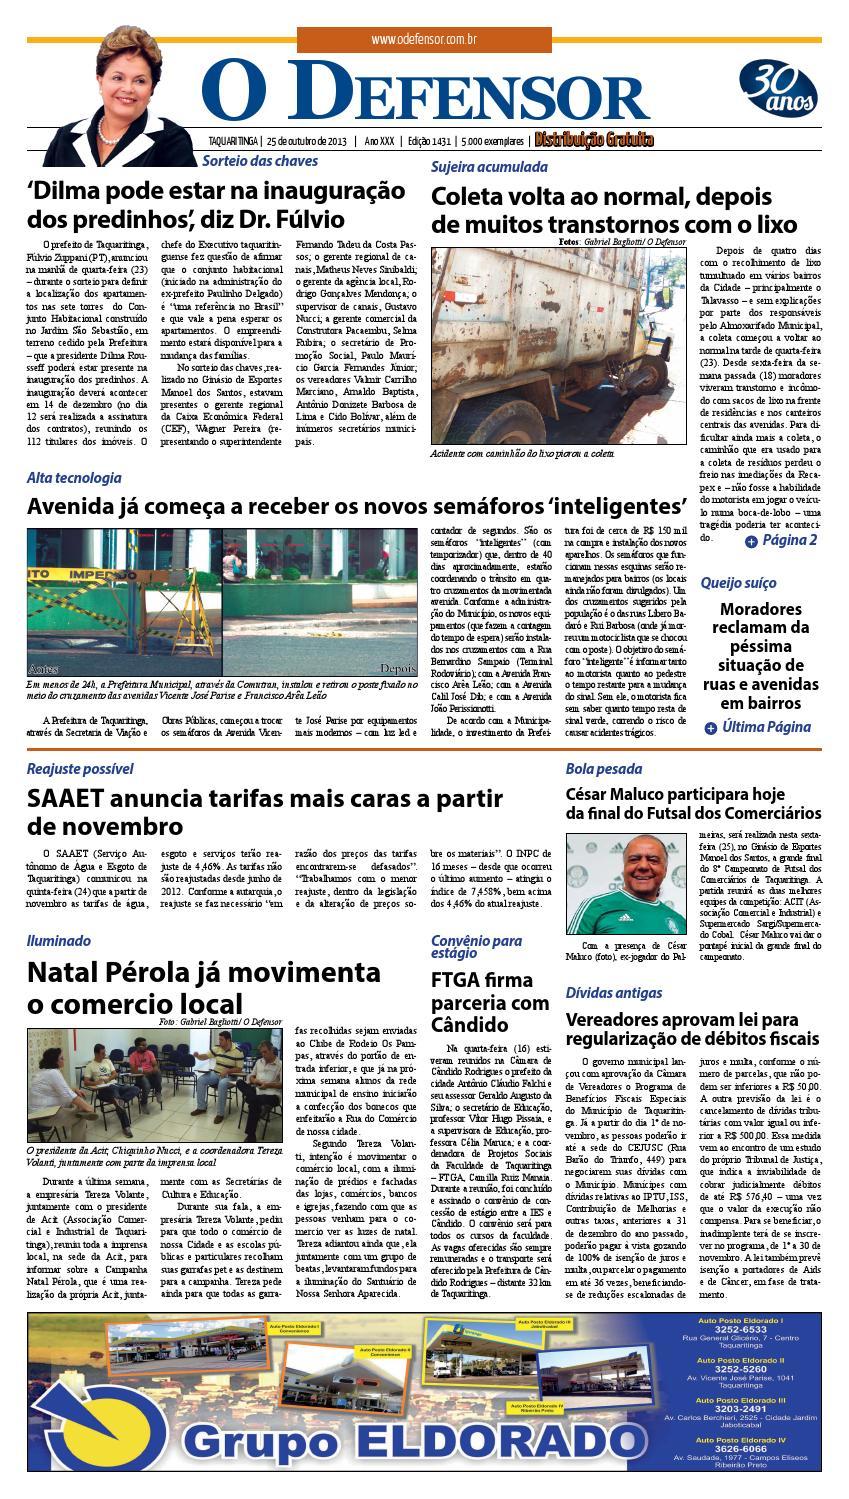 Jornal O Defensor 25 10 2013 by gabriel baglioti - issuu d475b9105ee1b